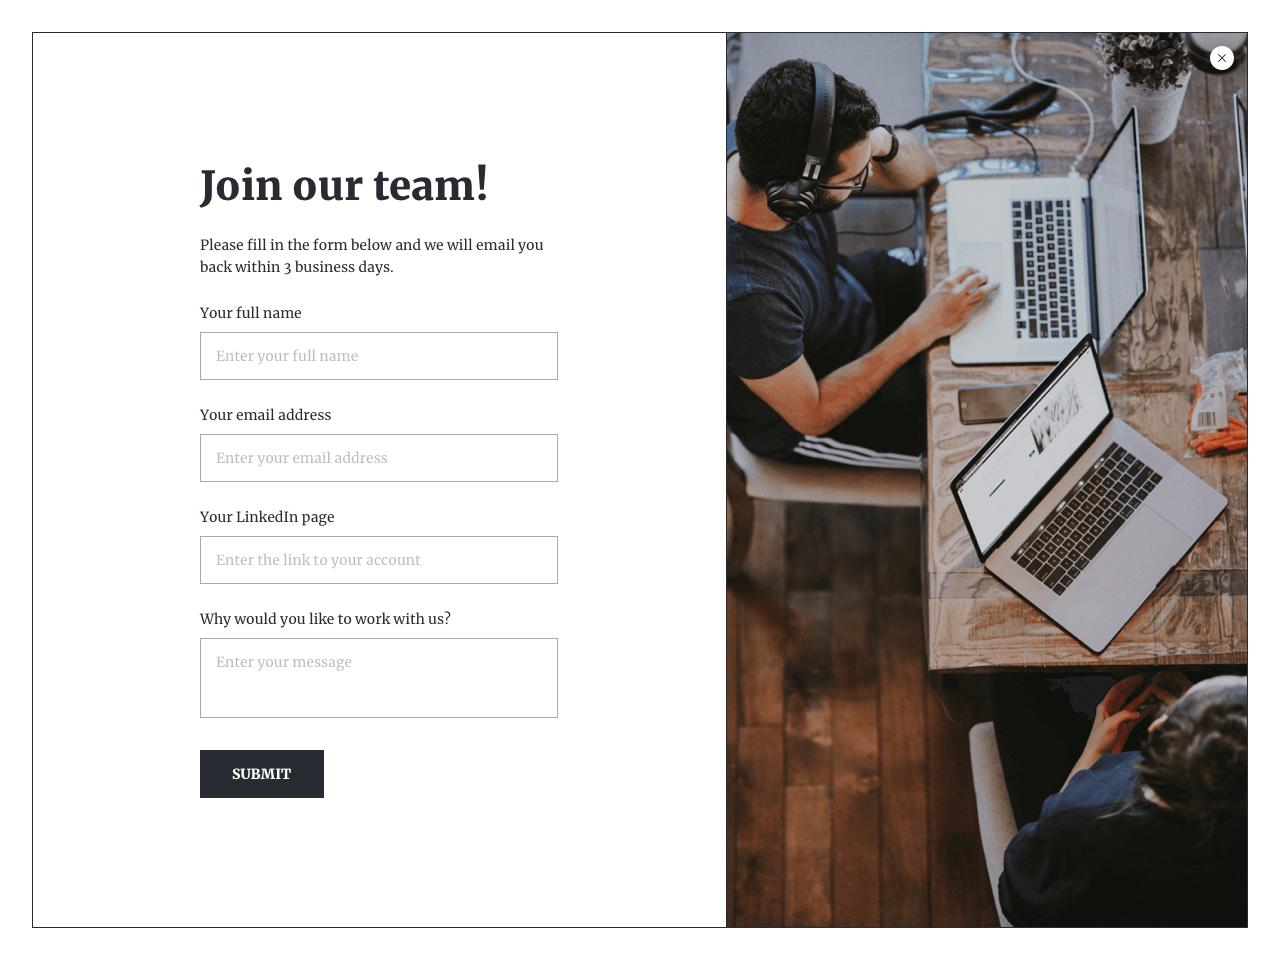 Fullscreen job application form template powered by Getsitecontrol